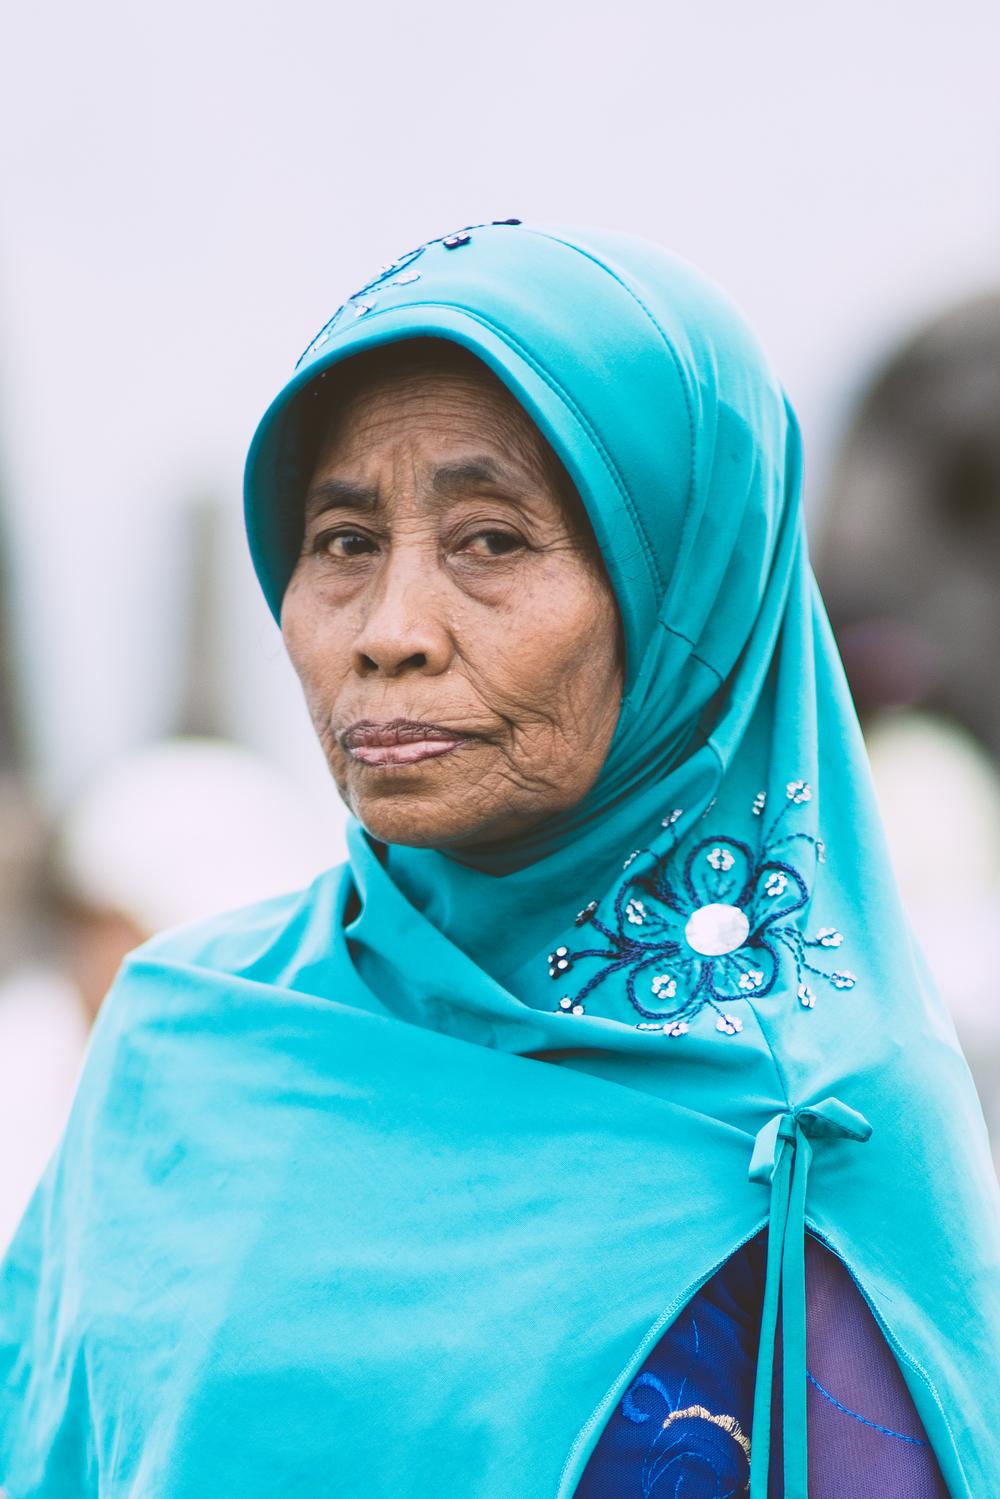 ASHarris_SQUARESPACE-Indonesia_DSC_9428.jpg